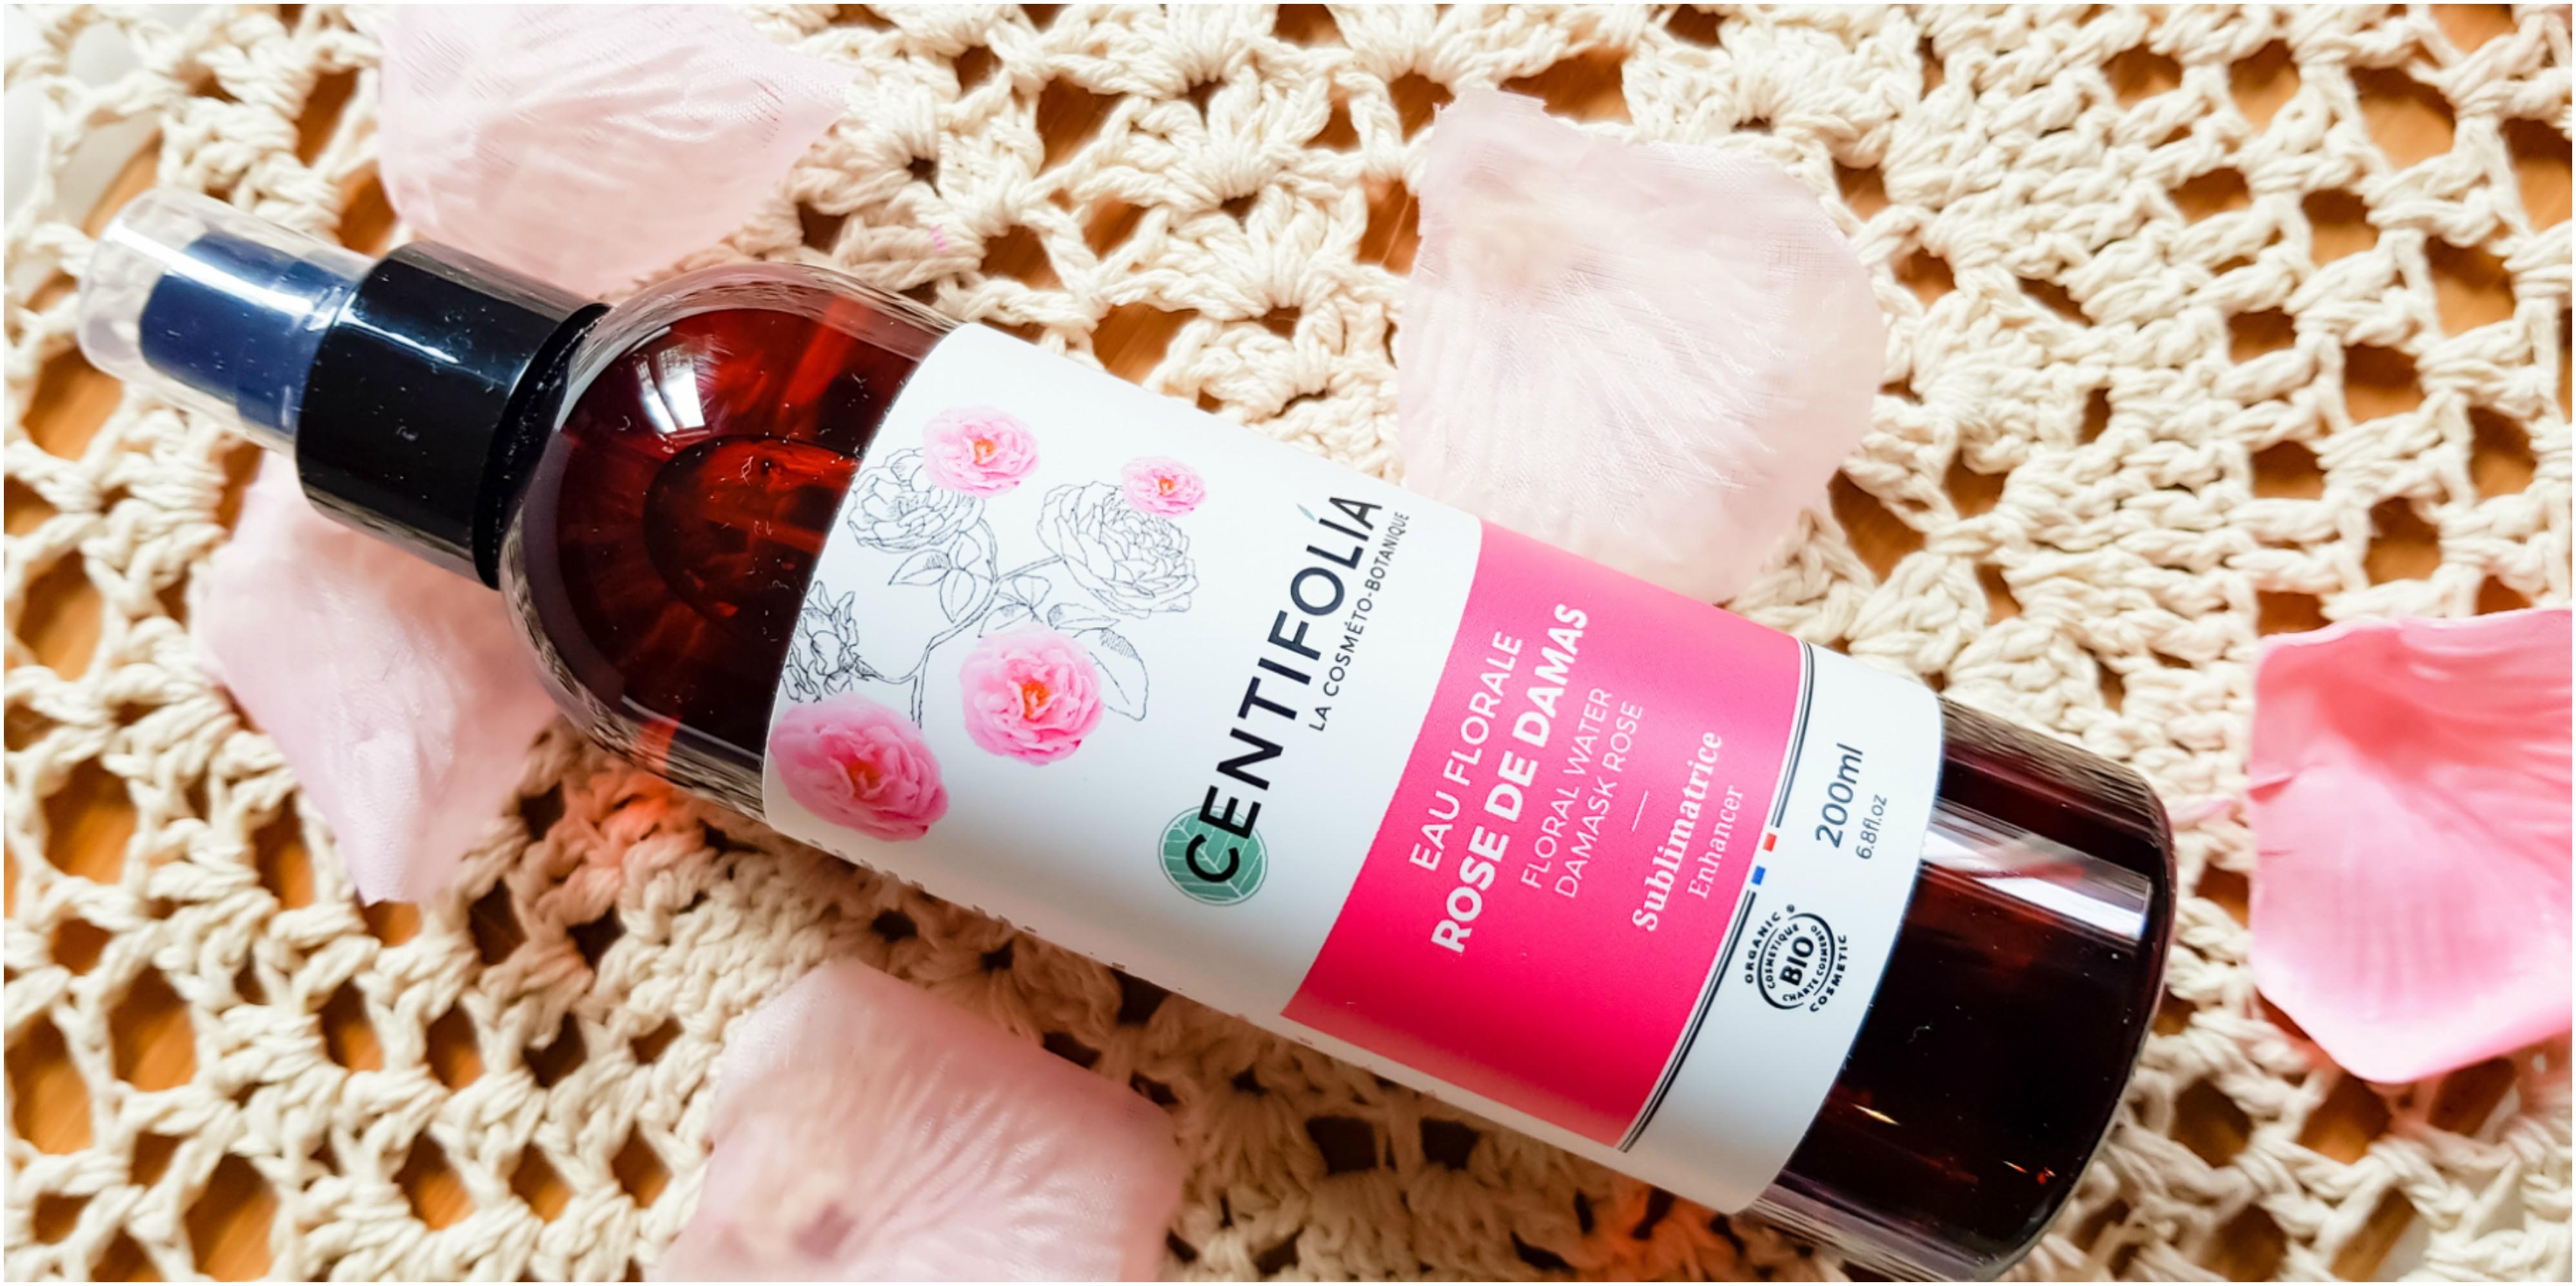 Centifolia-eau-florale-rose-bio-damas